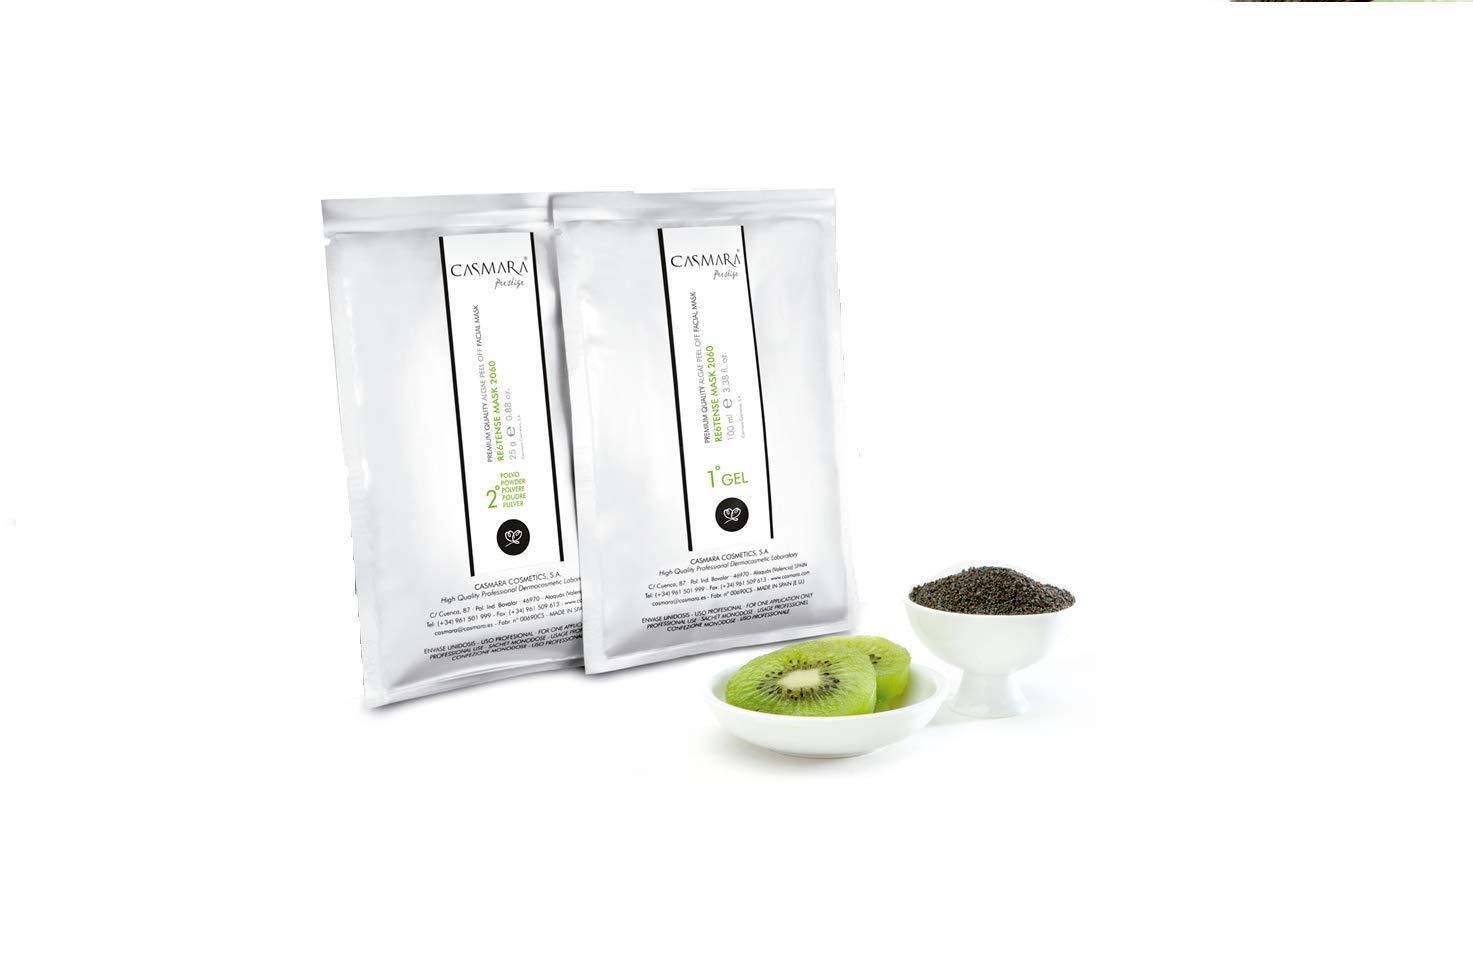 Casmara Premium Quality Algae Peel Off Facial Masks 4.26 Ounce/mask Gel(3.38 Oz)/Mask Powder(0.88 Oz) (re6tense) by Casmara